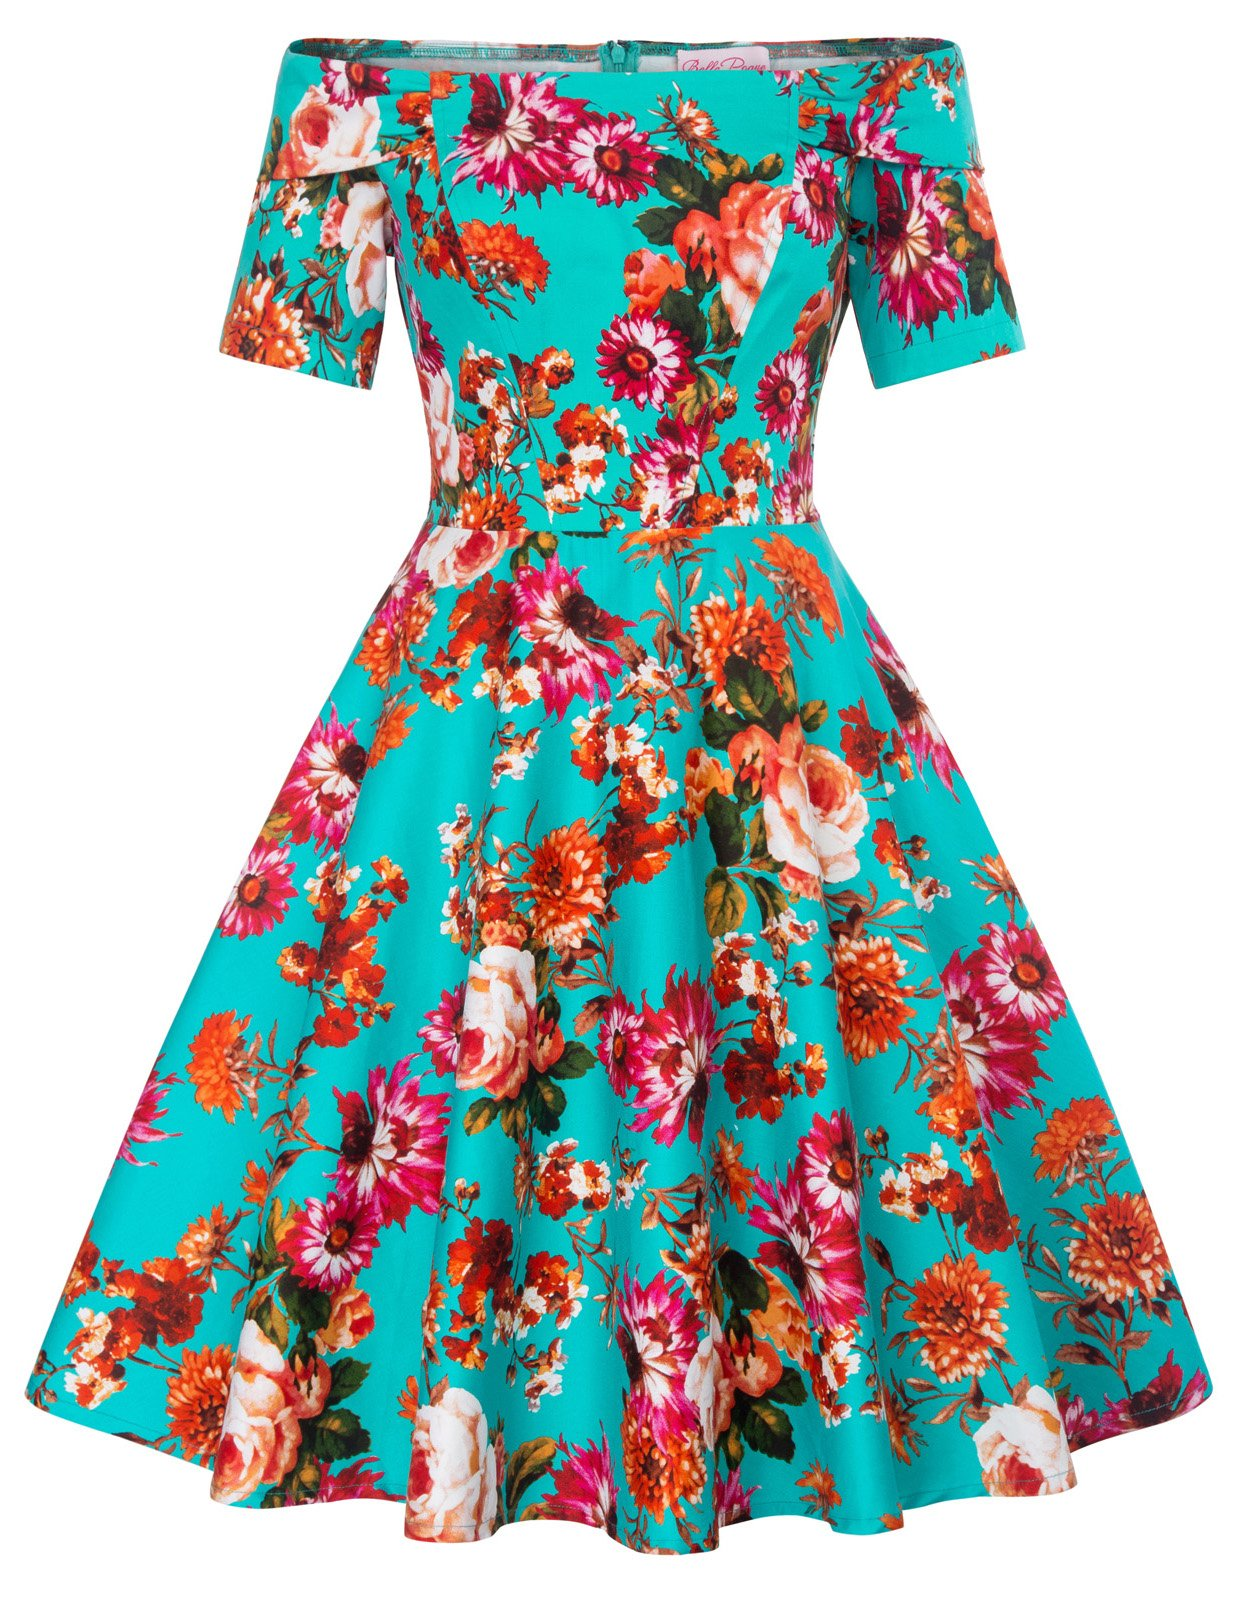 Available at Amazon: Women's 1950s Retro Vintage Off Shoulder A-Line Floral Dress